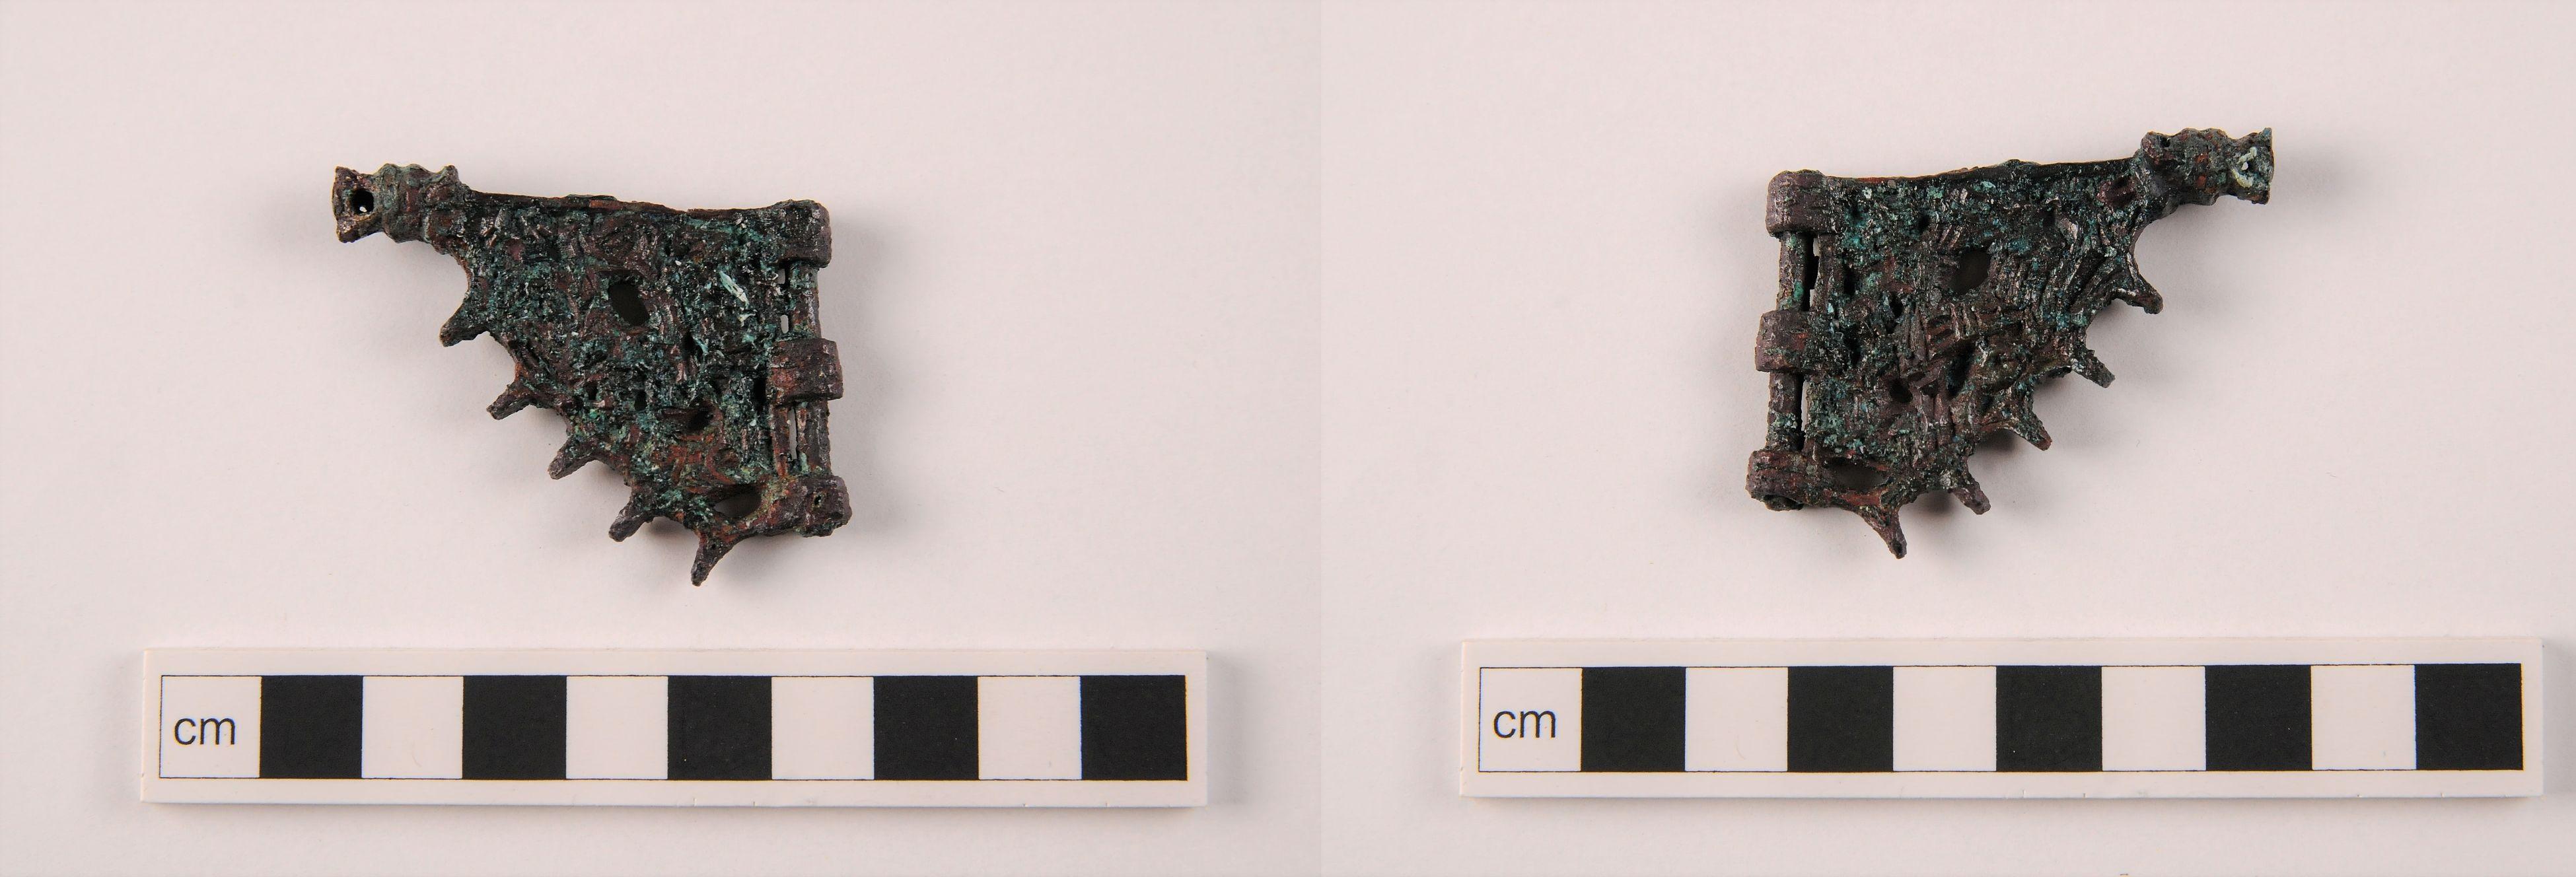 fb884f082c41 Korouhvička ze Söderby. Zdroj  katalog SHM.